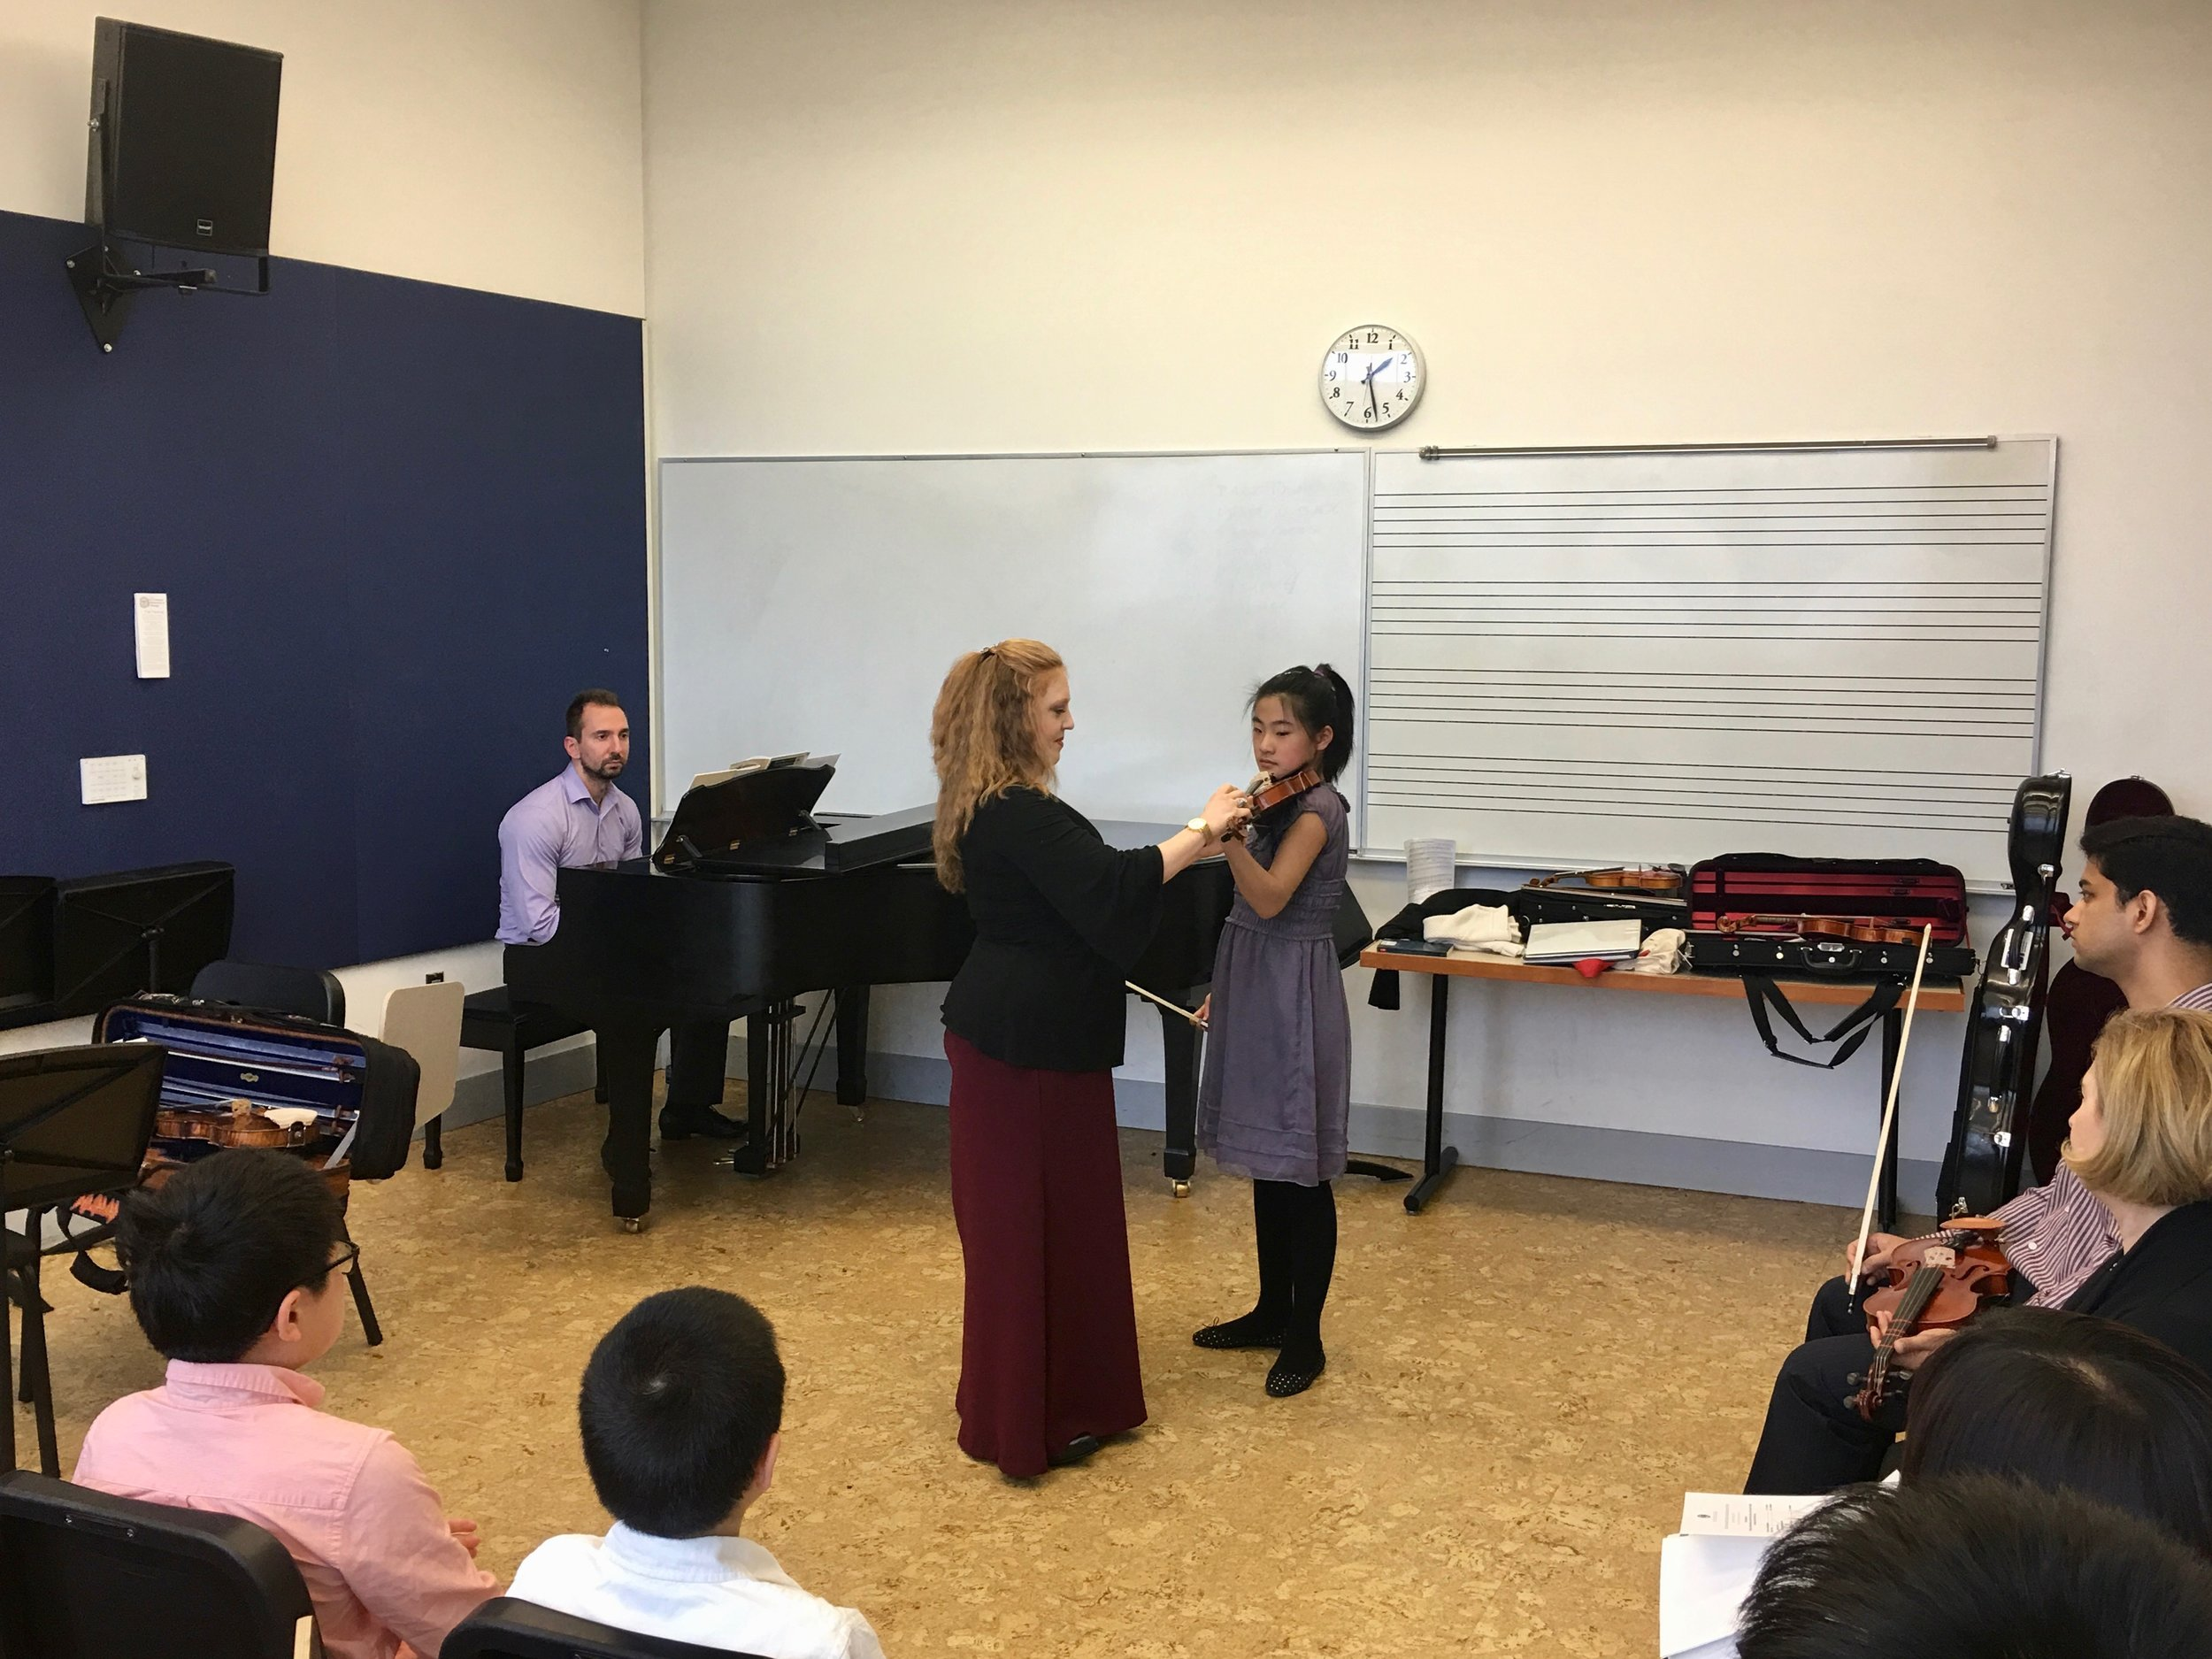 Angela and Rachel work on Minuet 1 by Bach.